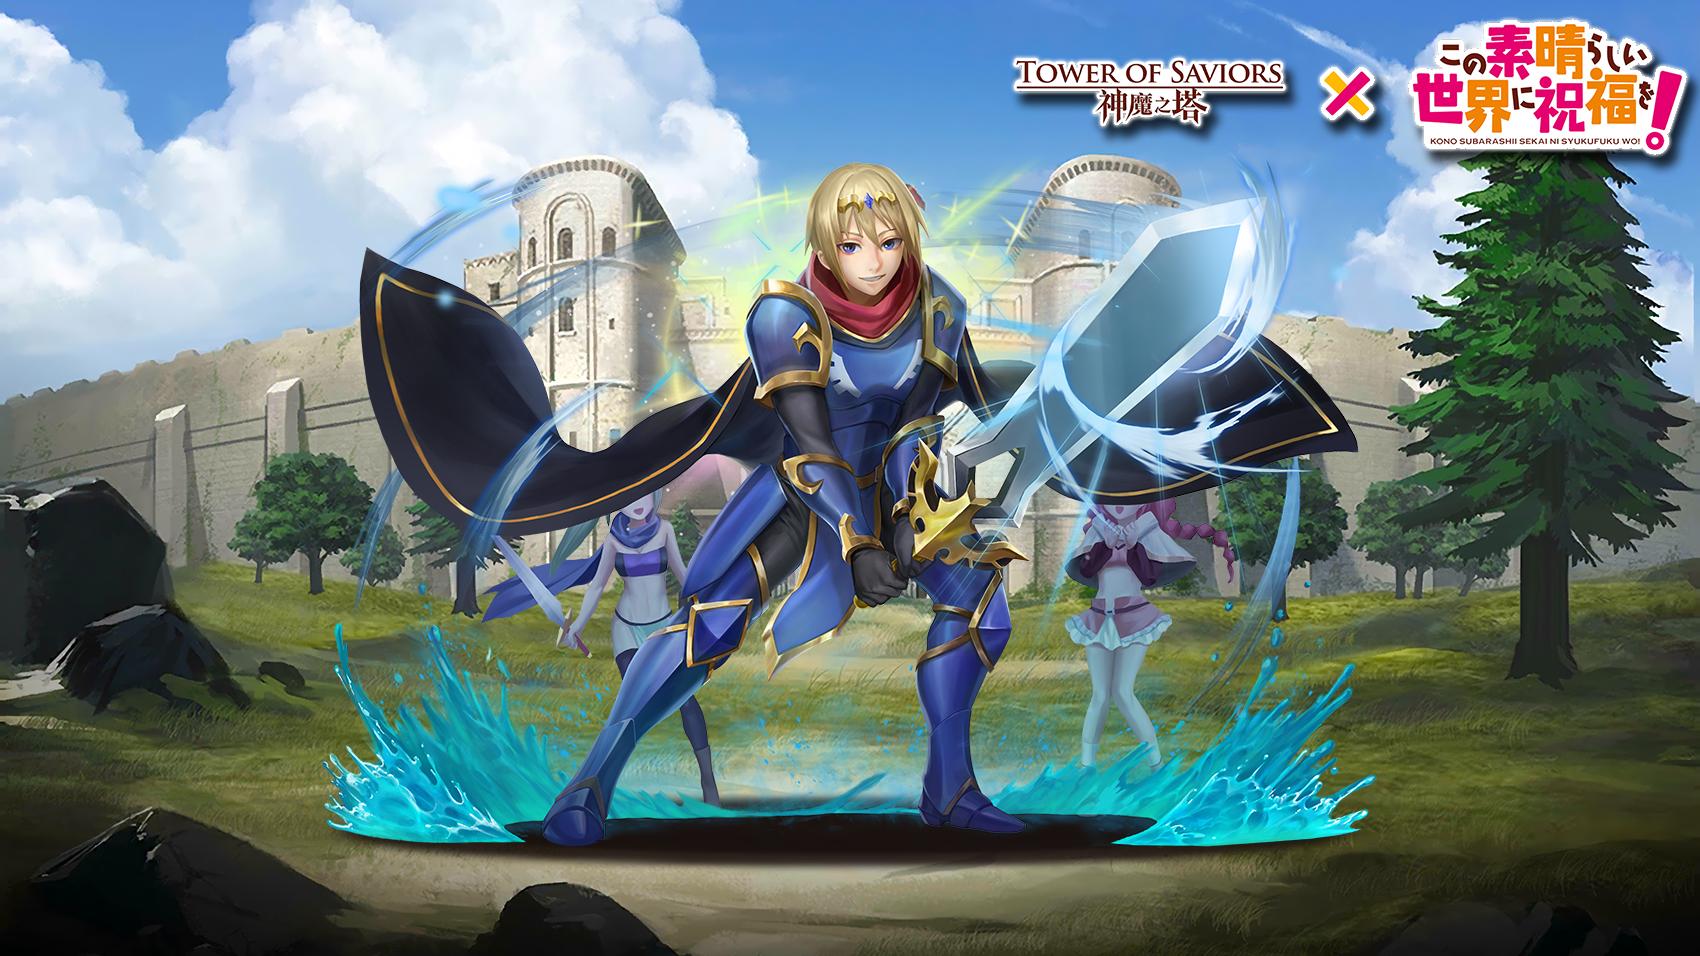 Cursed Sword Owner - Mitsurugi Kyouya